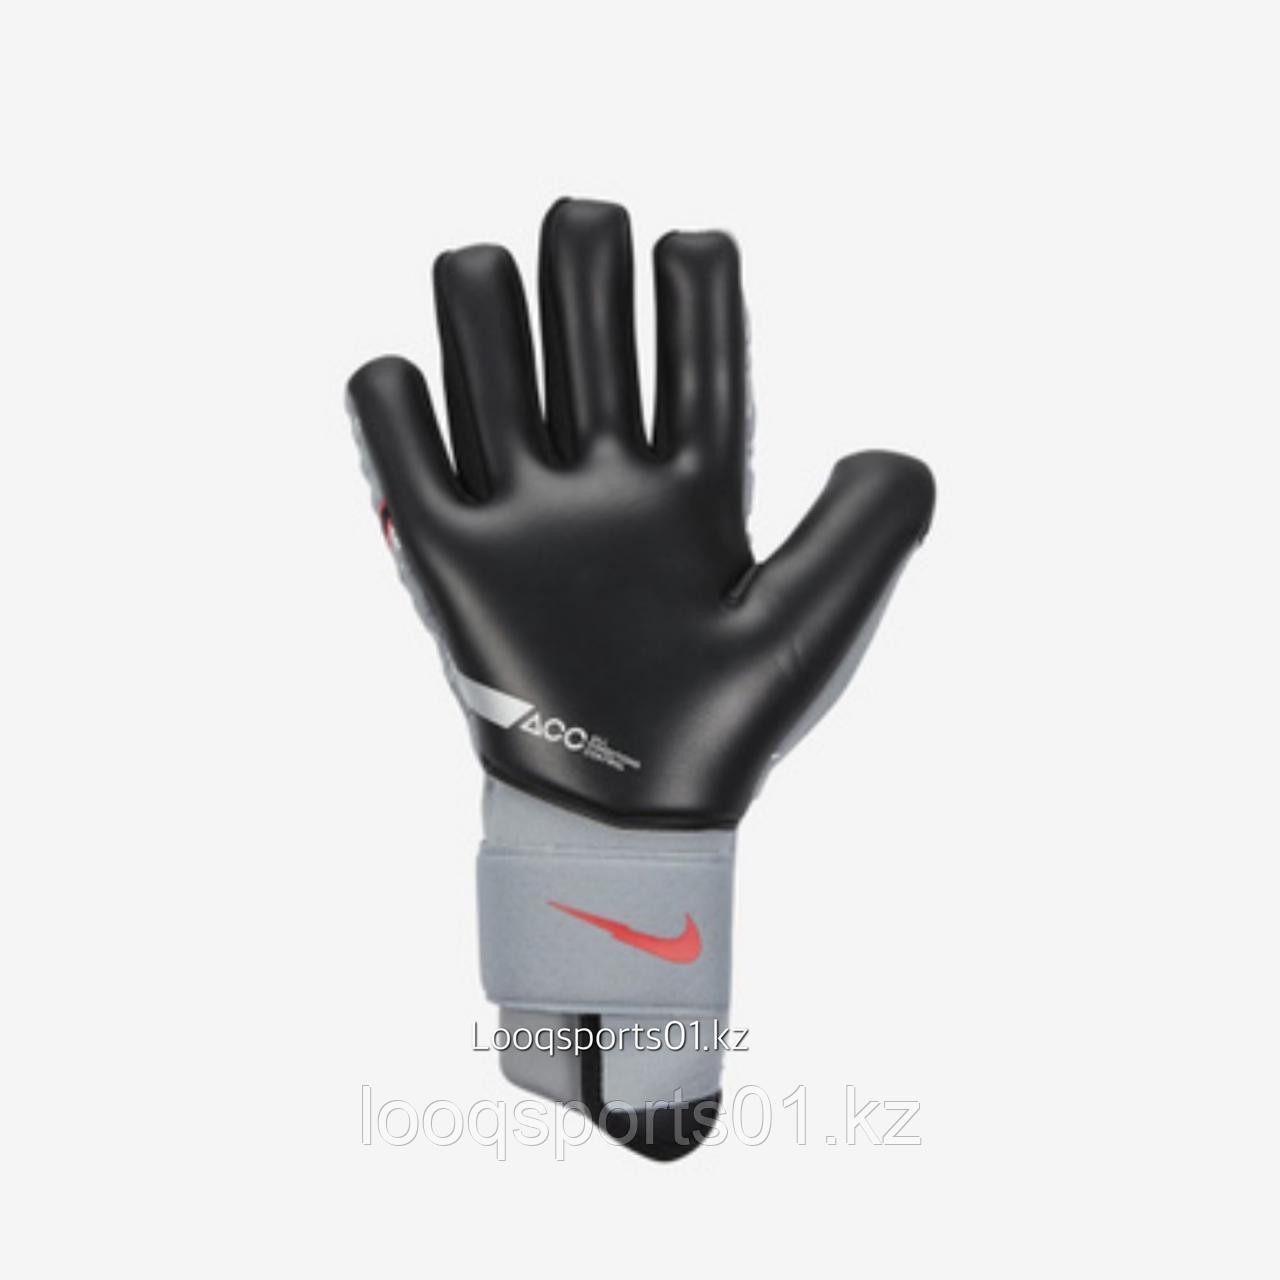 Вратарские перчатки Nike Phantom Elite (8)